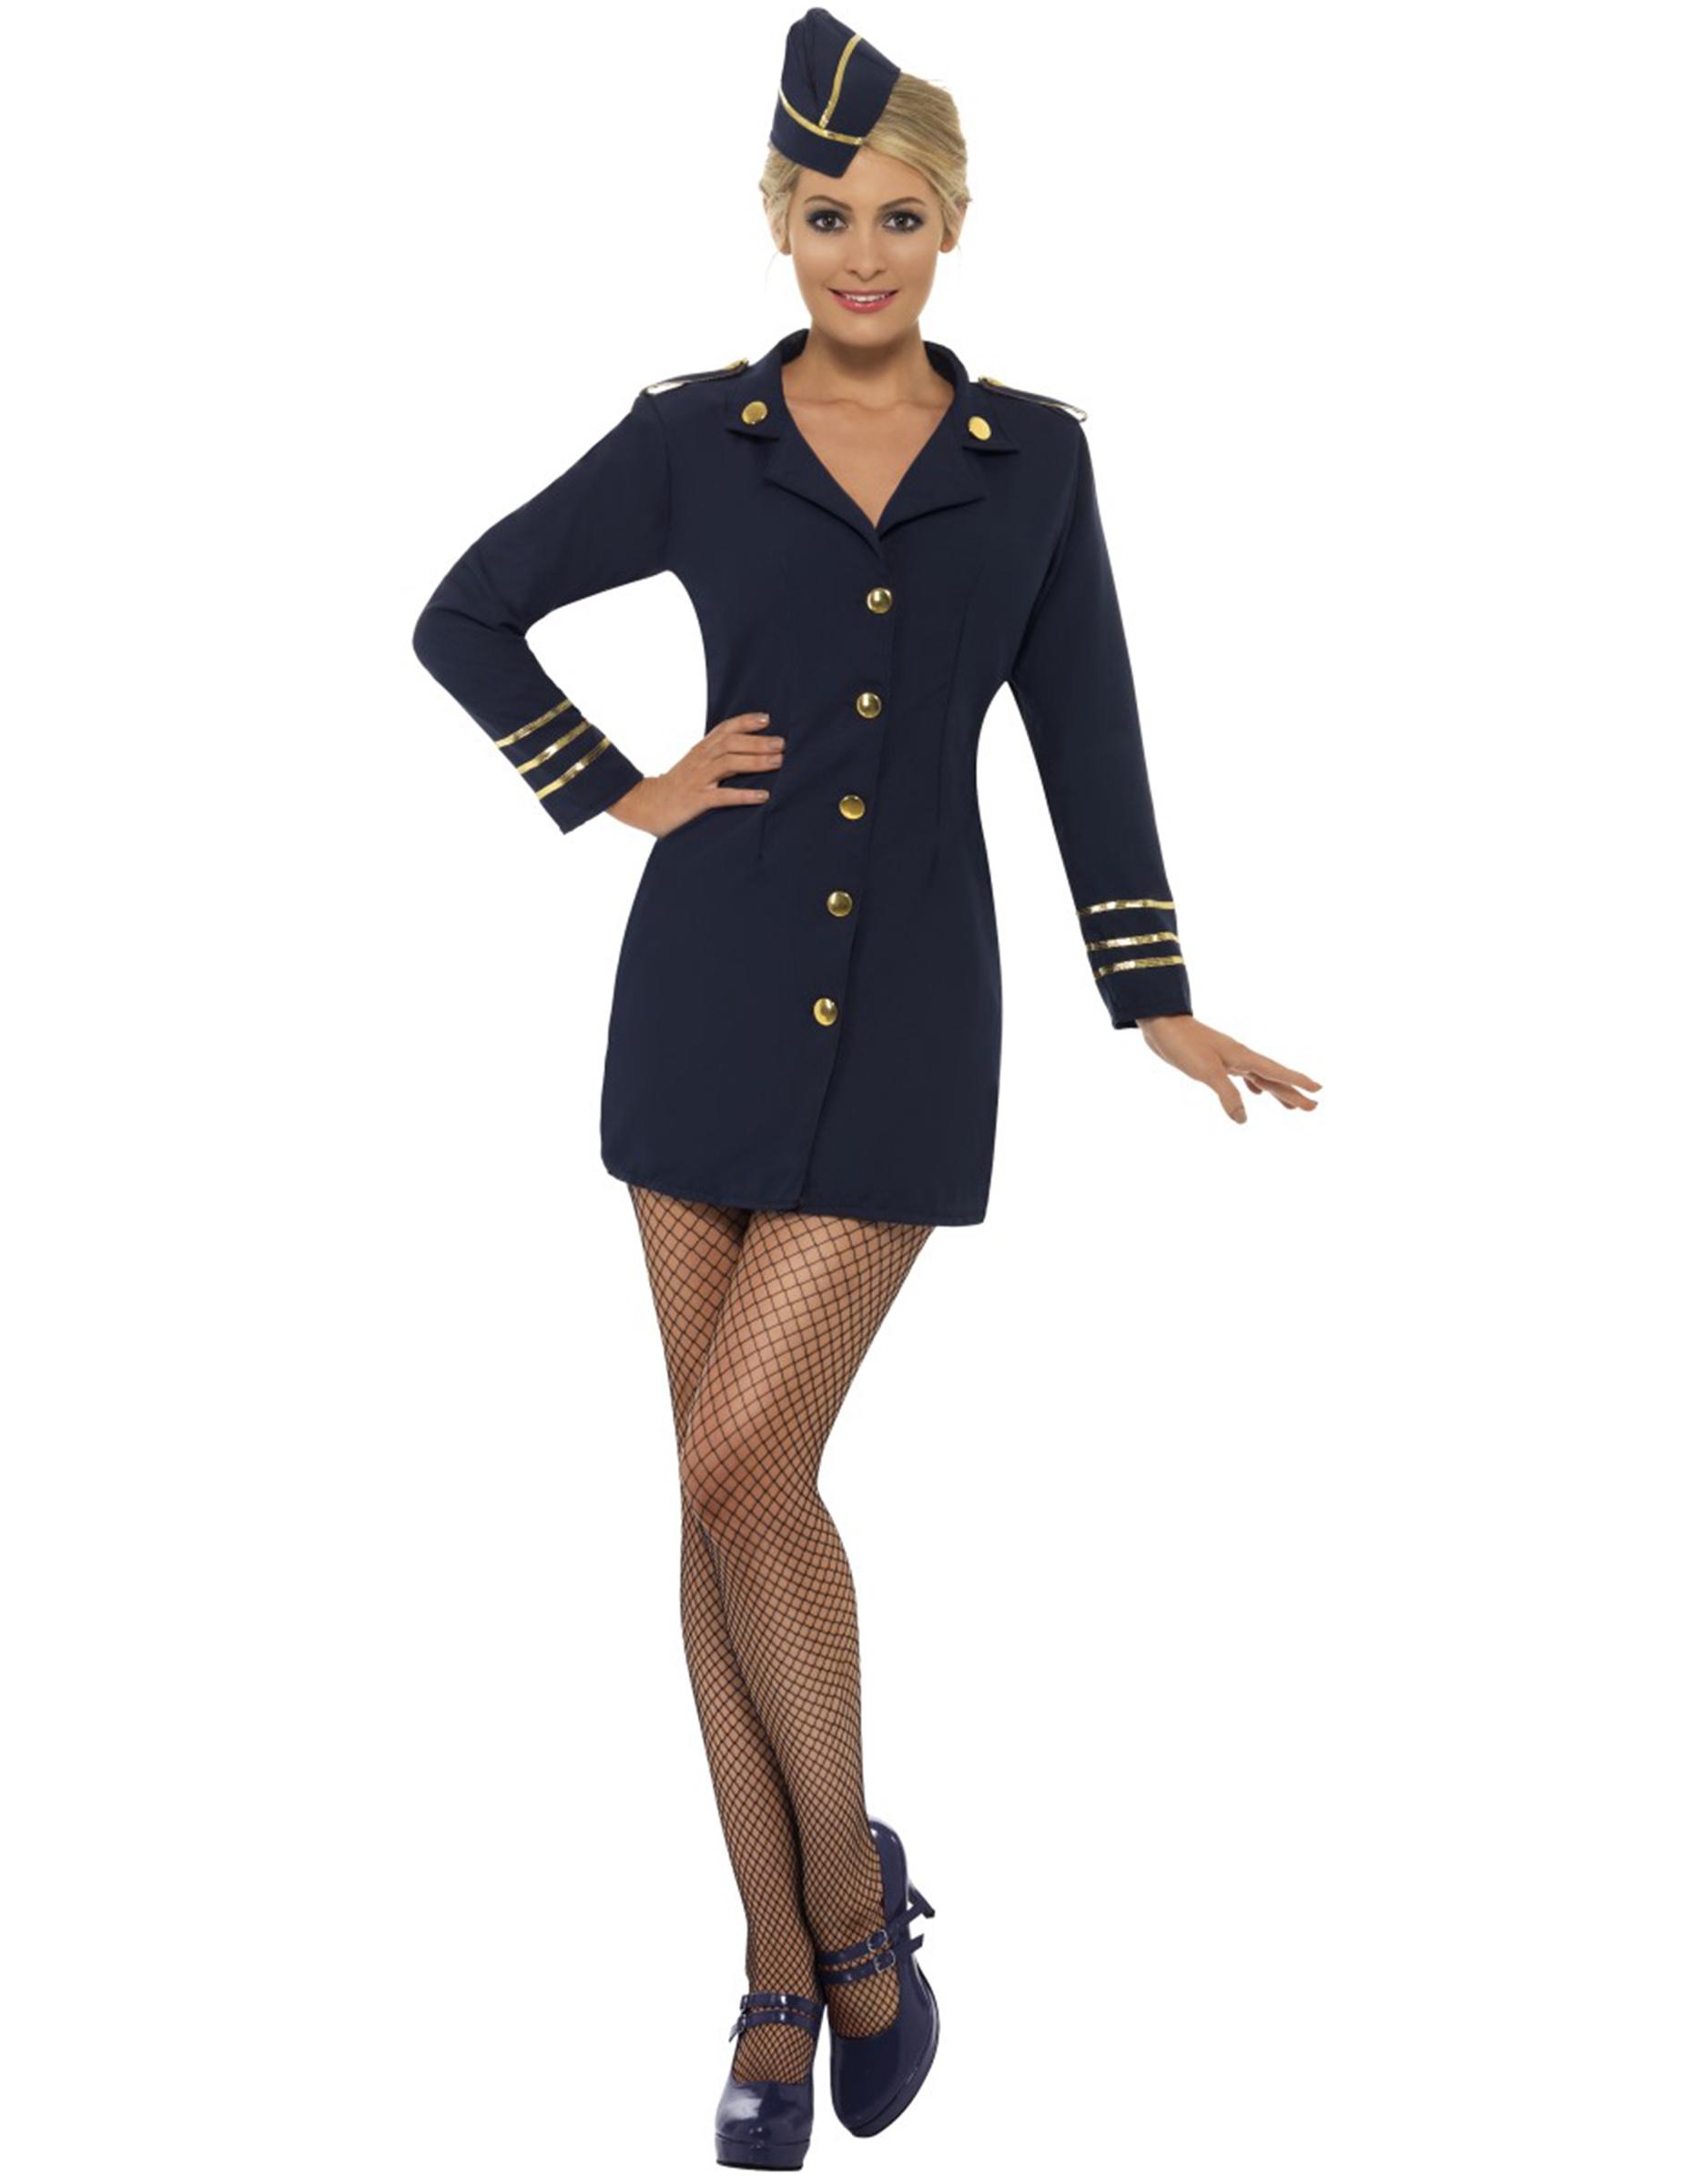 a56dbea04608a Retro Stewardess Kostüm Damen Uniform Flugbegleiterin Damenkostüm ...